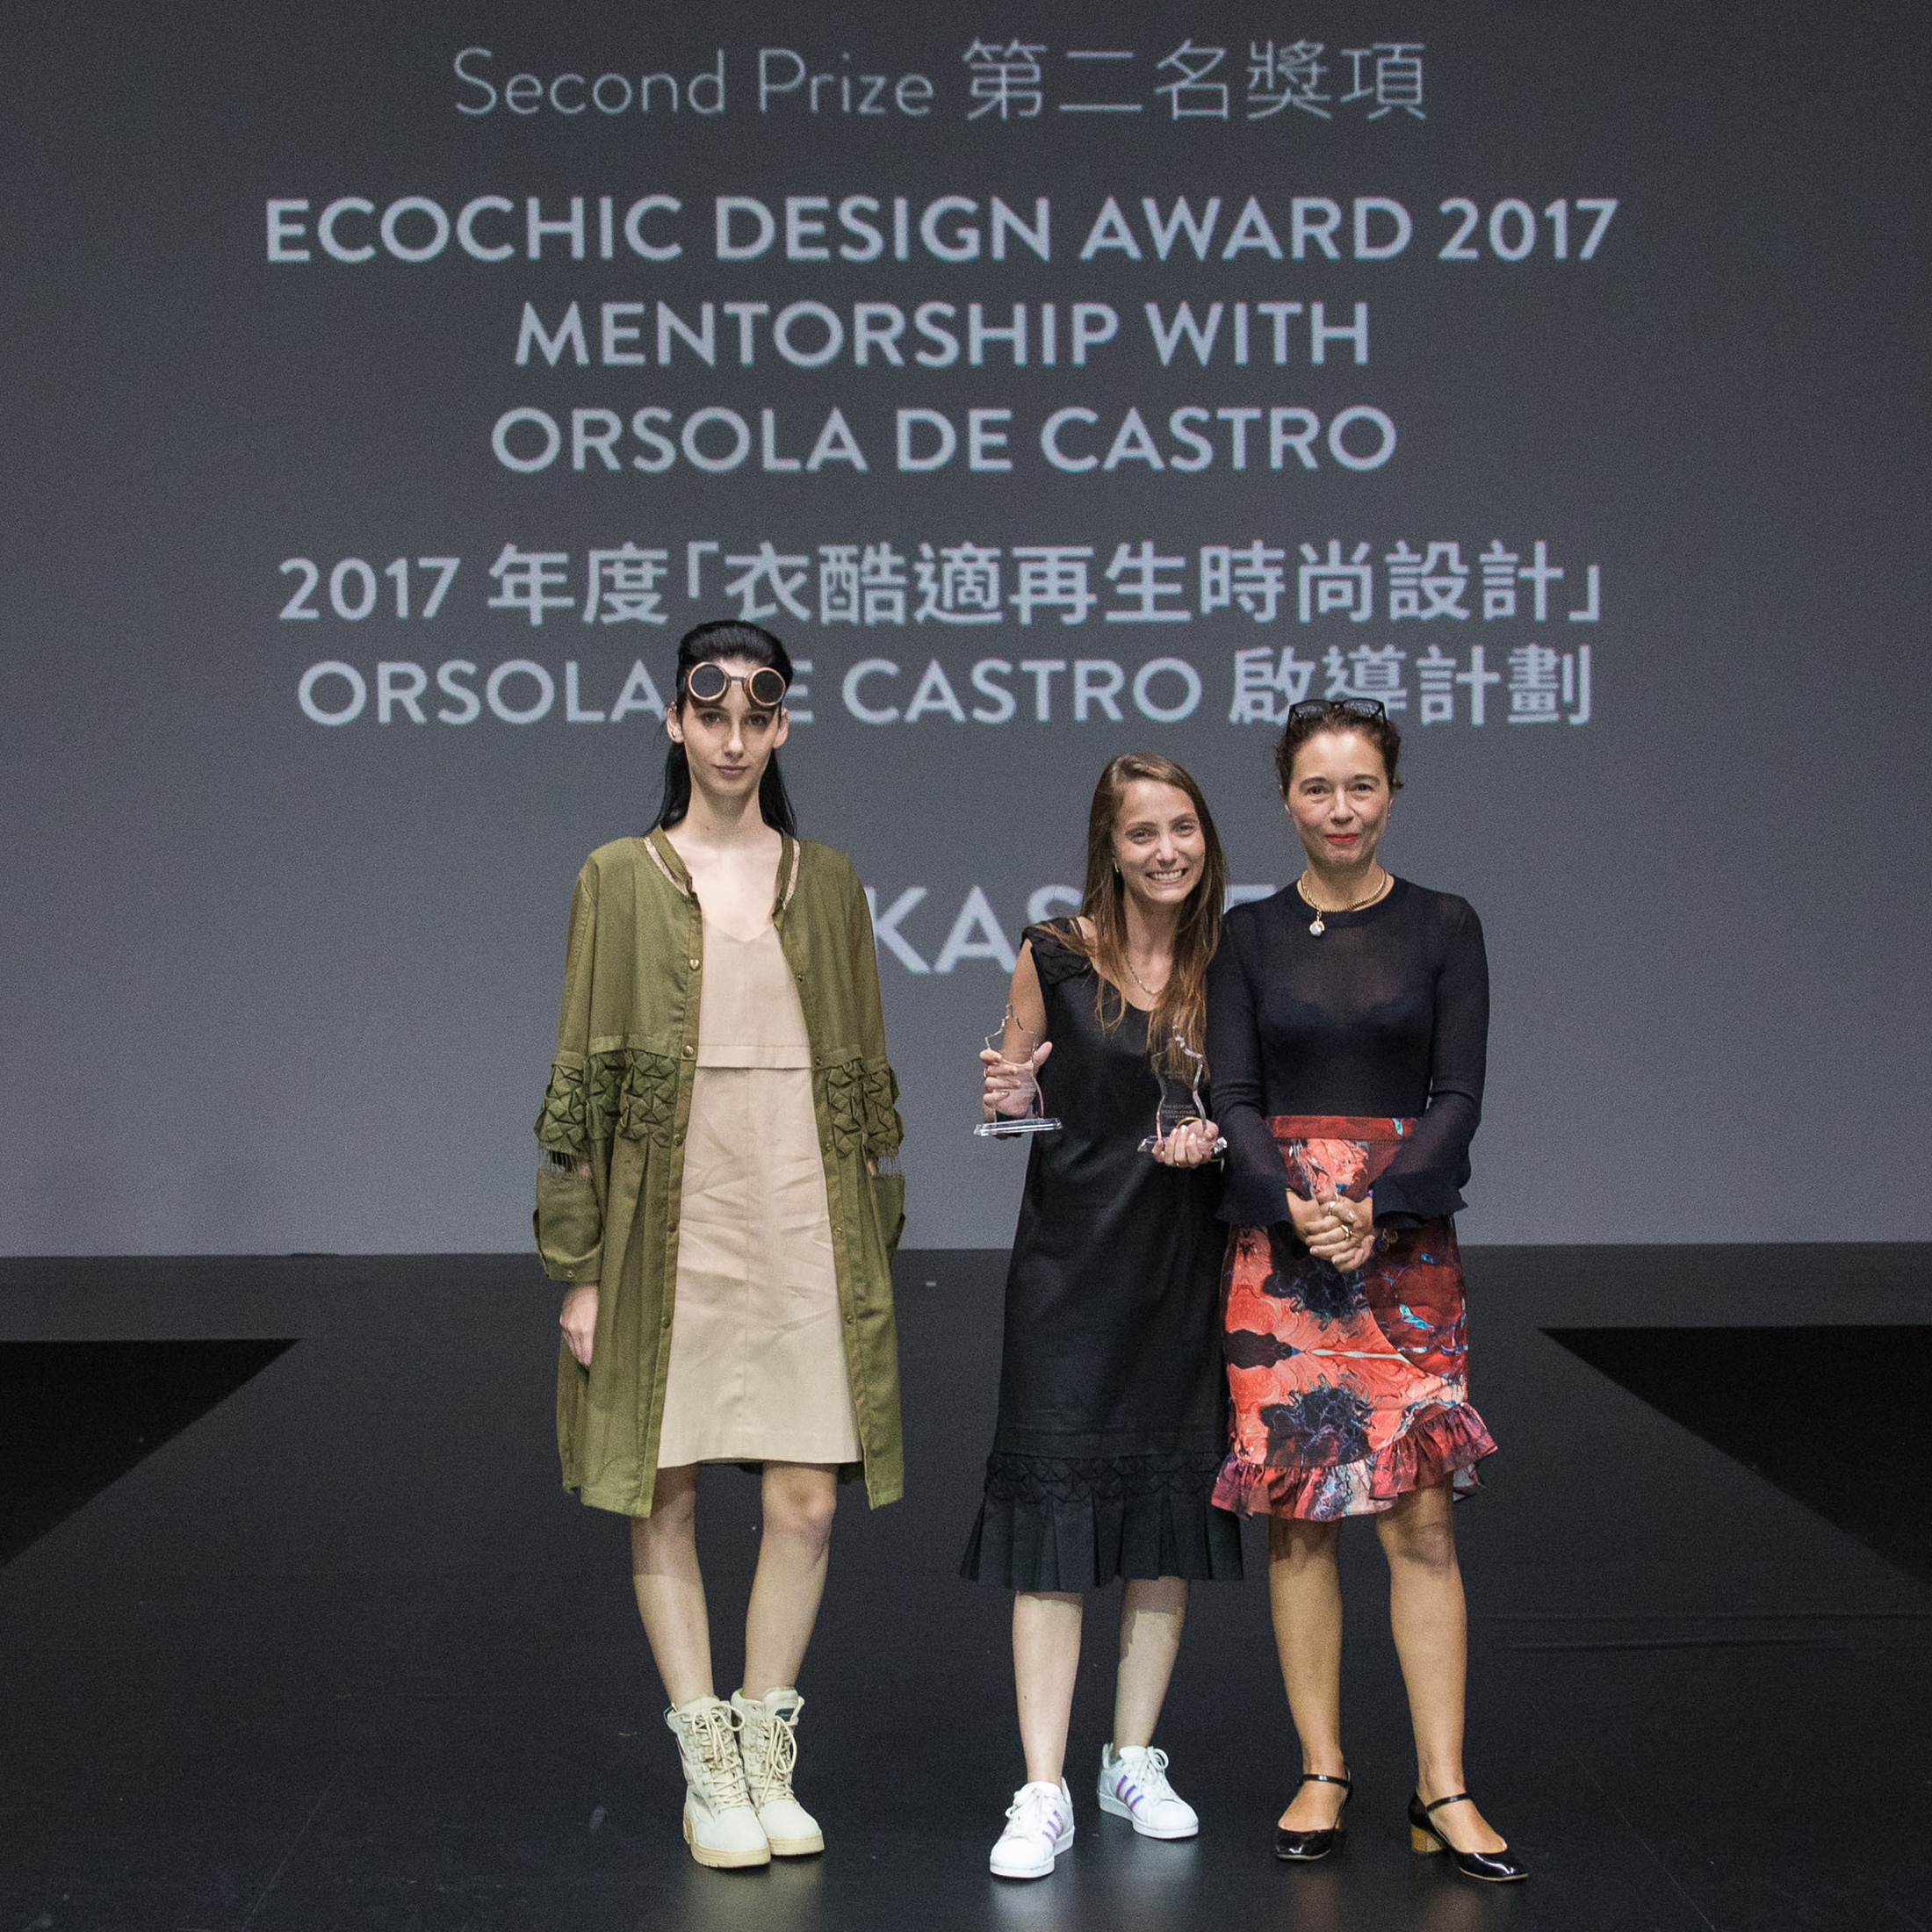 Second prize: The EcoChic Design Award 2017 Mentorship with Orsola de Castro   Lia Kassif, Israel